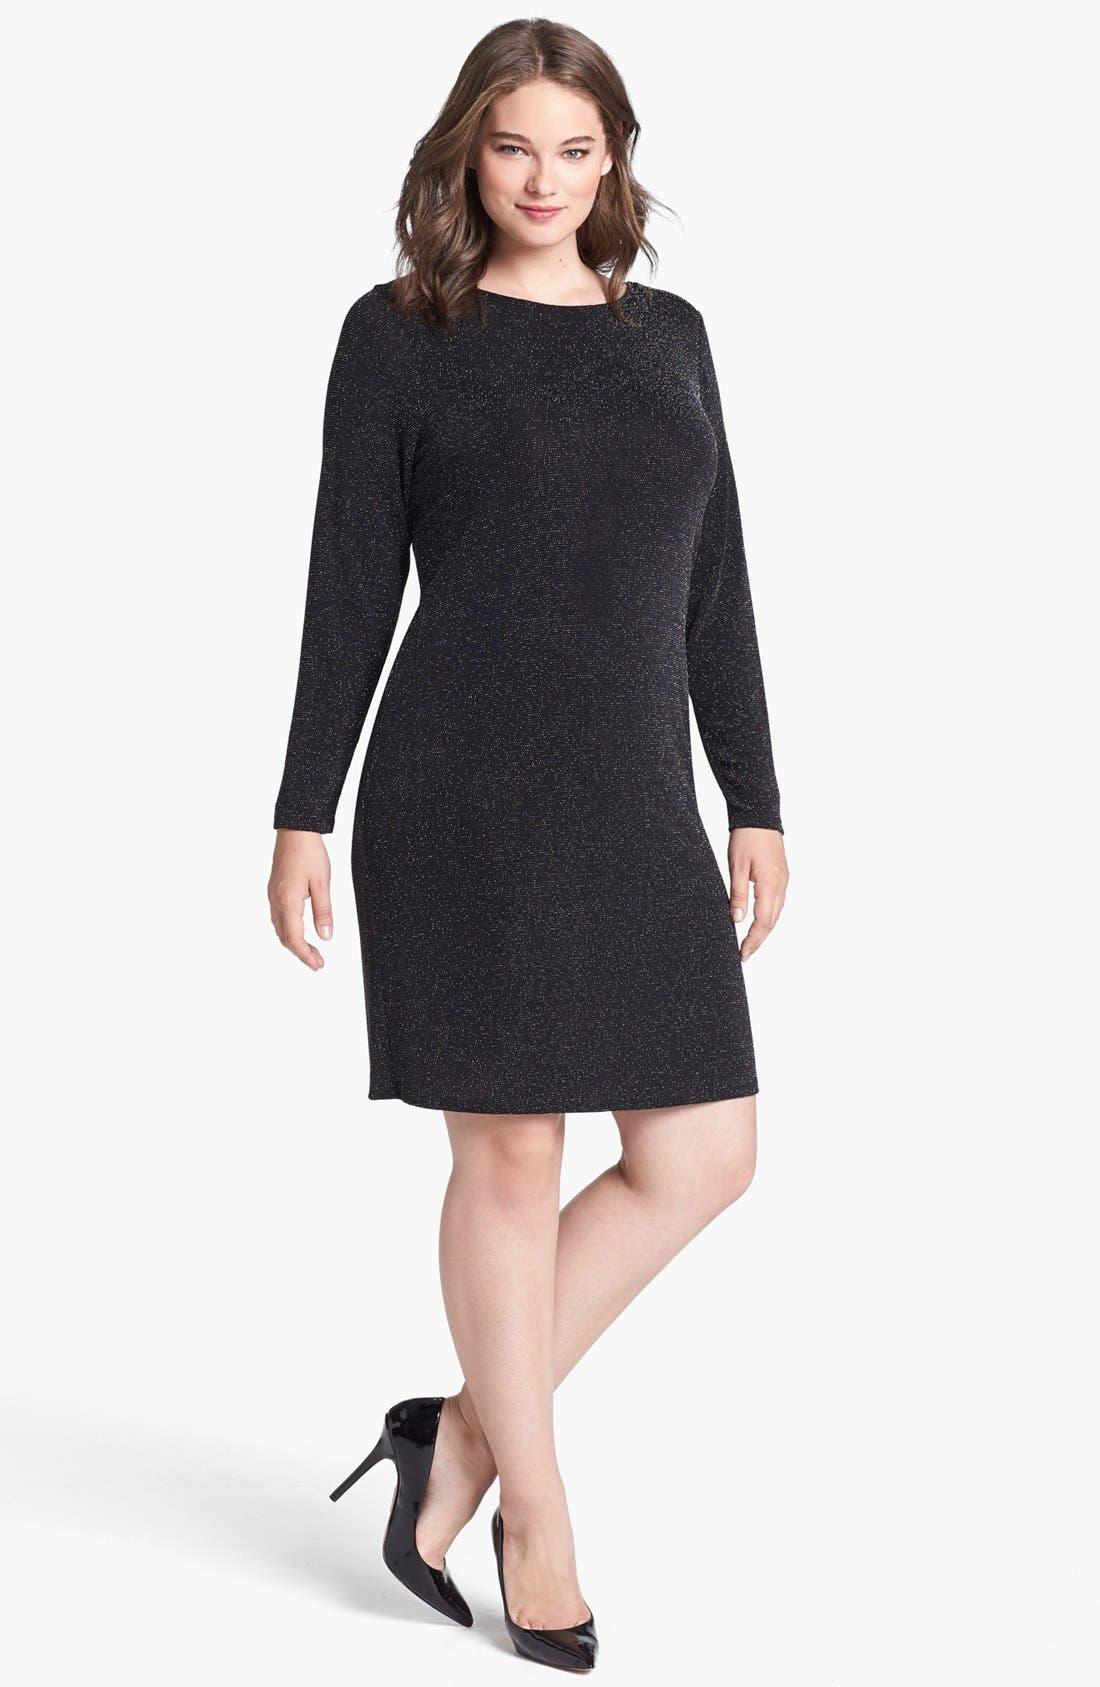 Alternate Image 1 Selected - MICHAEL Michael Kors Back Drape Dress